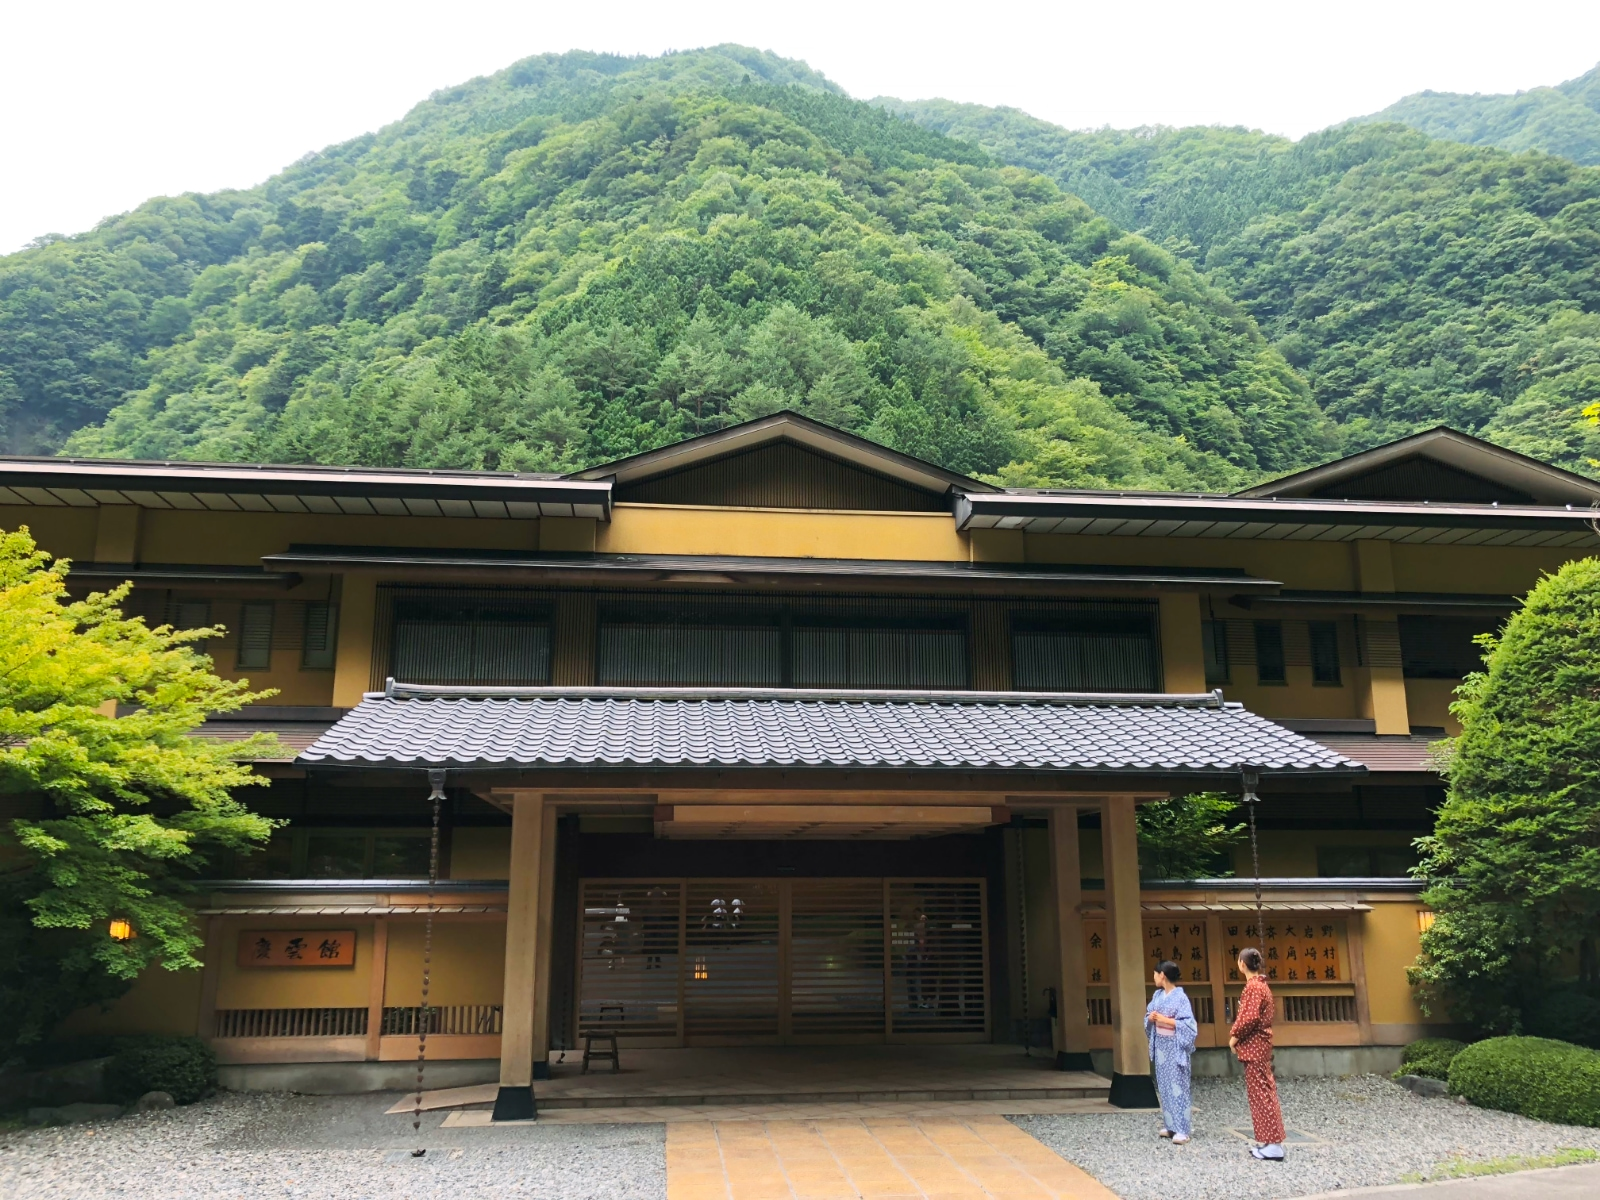 The Worlds Oldest Hotel What Its Like To Stay At Japans Mount Fuji Shizuoka Tourist Pass Mini 3 Days Nishiyama Onsen Keiunkan Japan Today